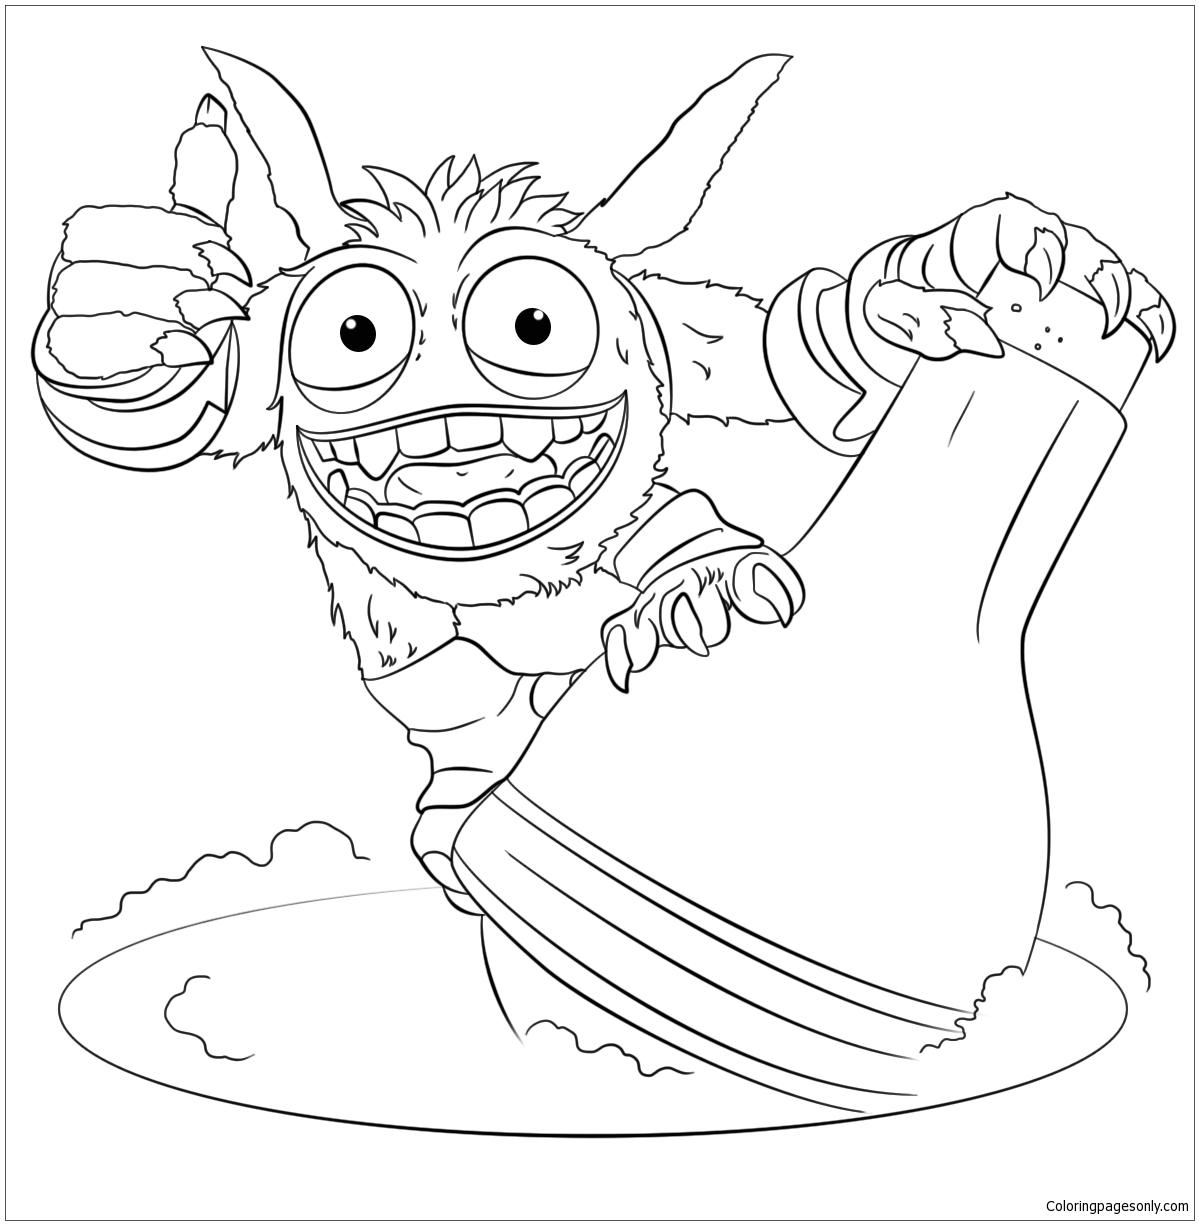 Skylanders Giants Pop Fizz Coloring Page - Free Coloring avec Coloriage De Skylanders Giants